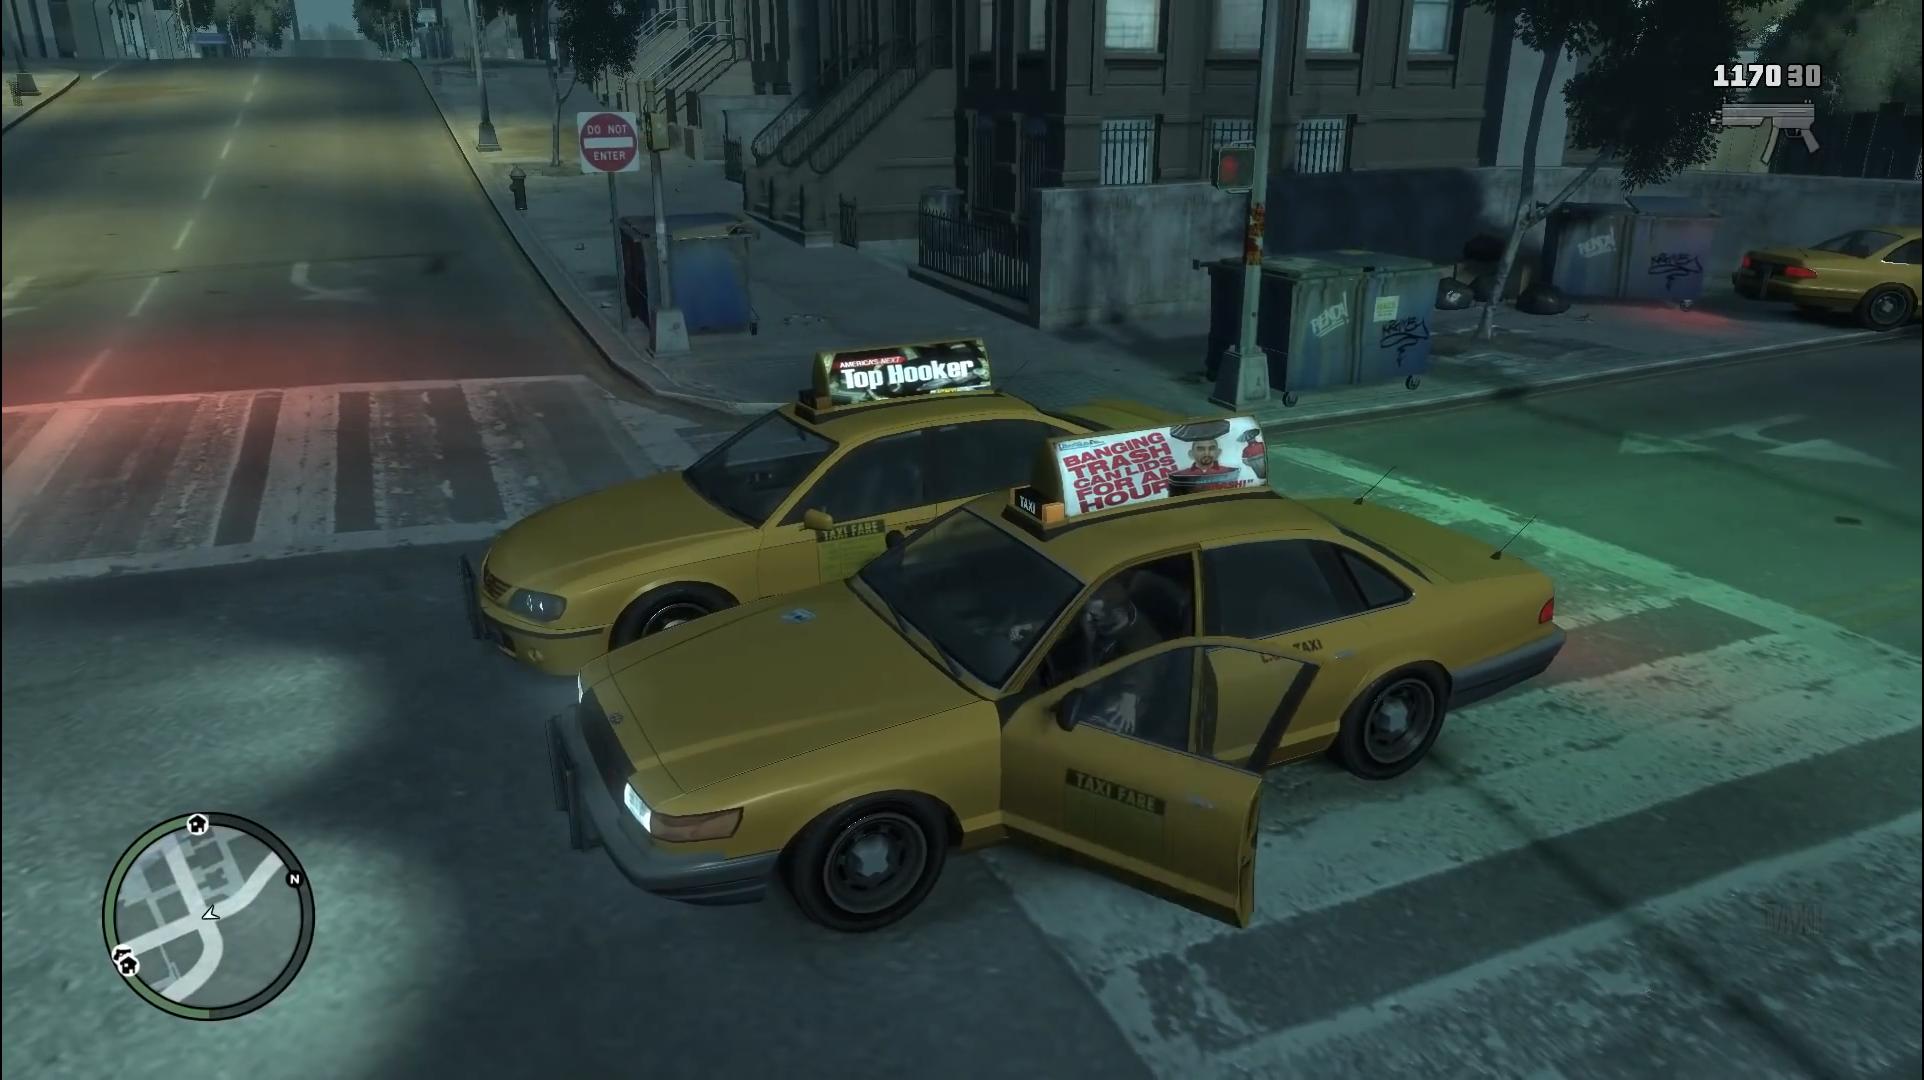 gta游戏发展史:各代出租车驾驶对比还是gta5中的司机